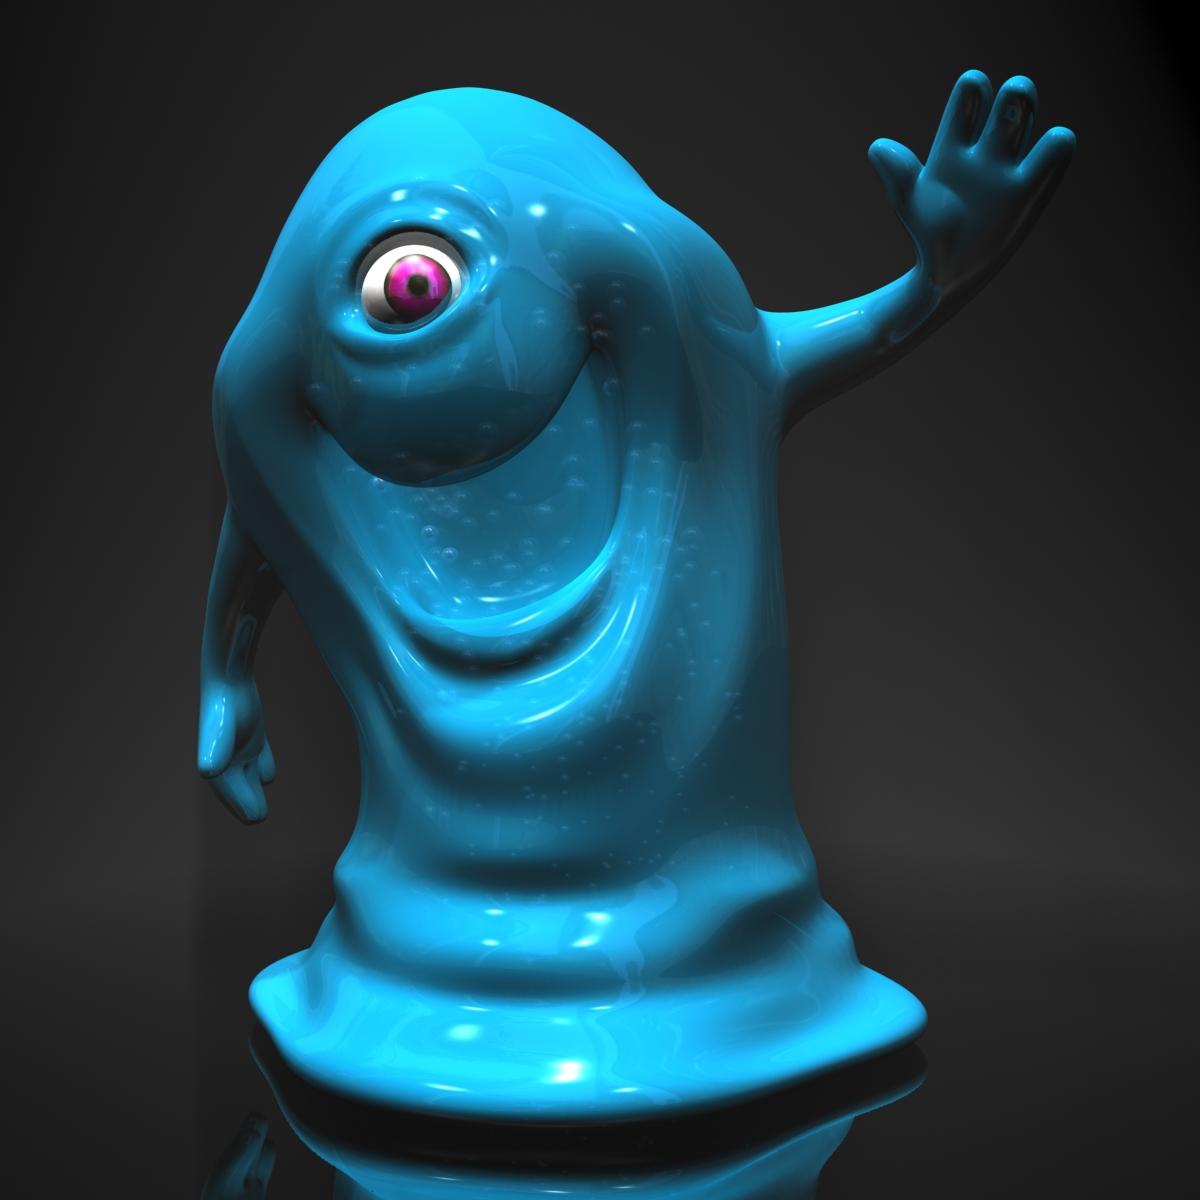 Bob from Monsters vs Aliens RIGGED 3d model 3ds max fbx  obj 214954